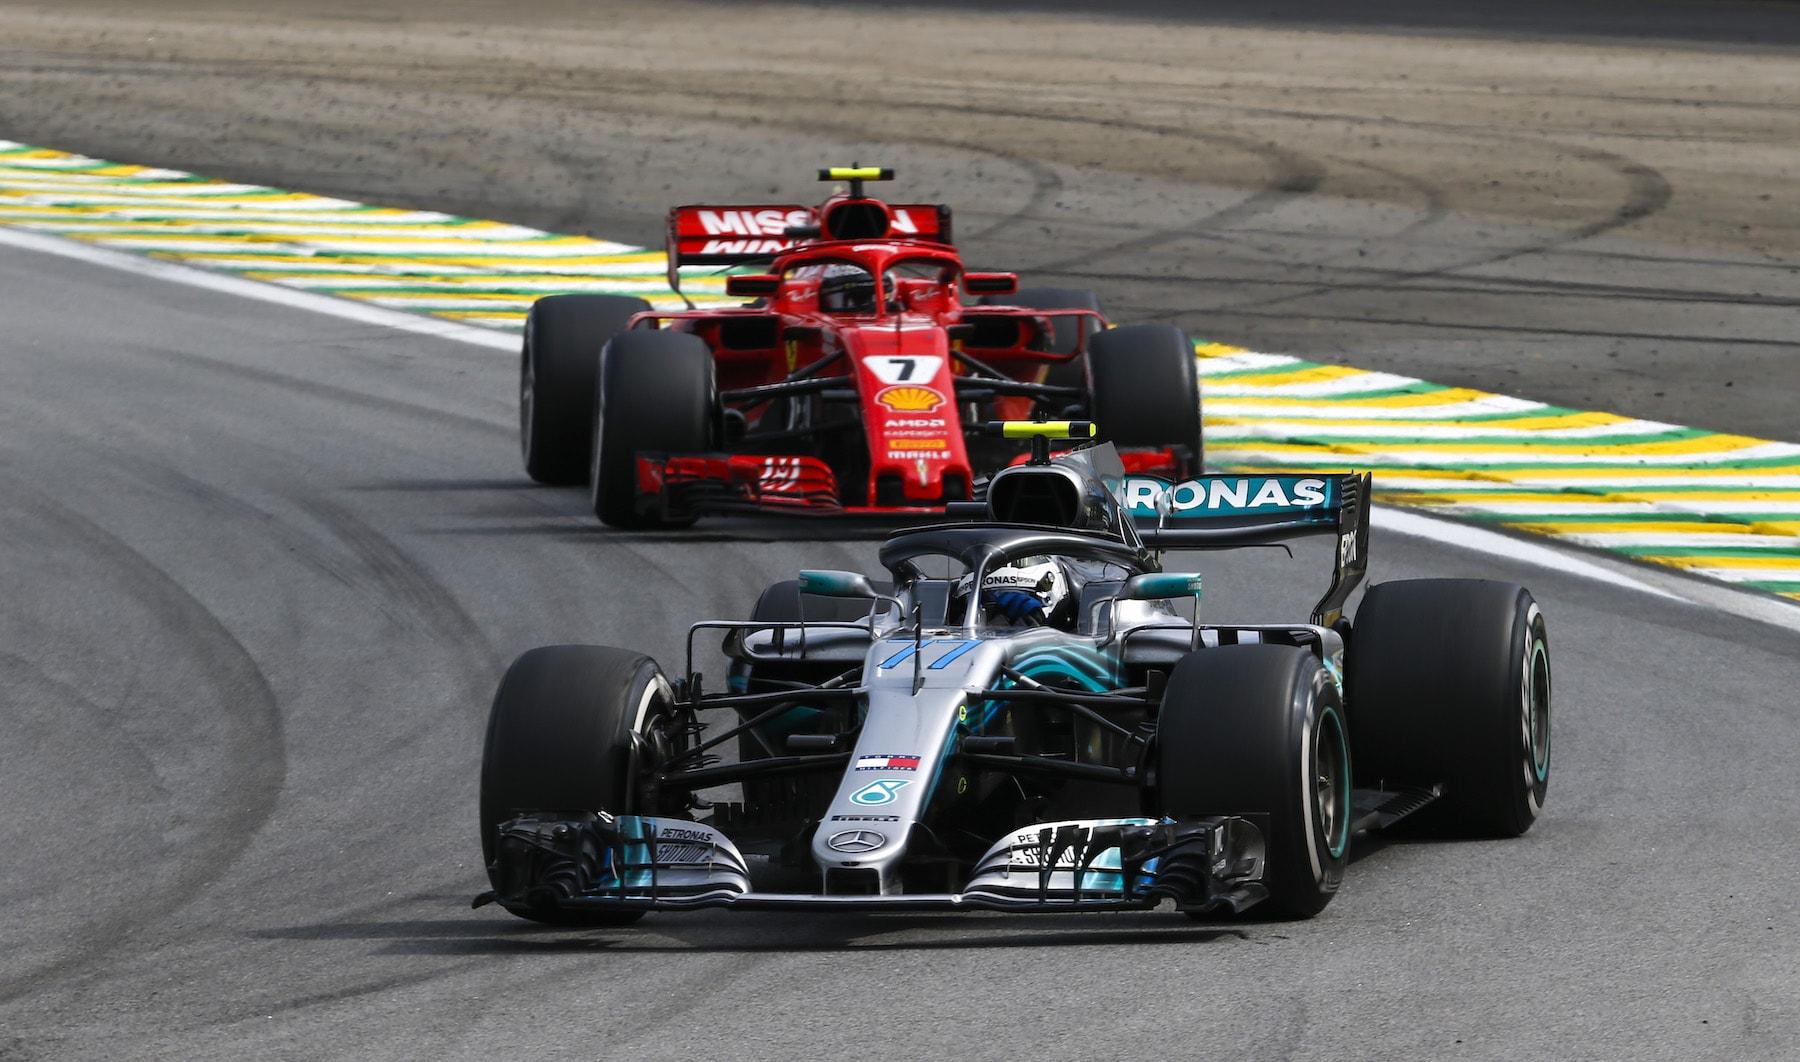 H 2018 Valtteri Bottas | Mercedes W09 | 2018 Brazilian GP 1 copy.jpg